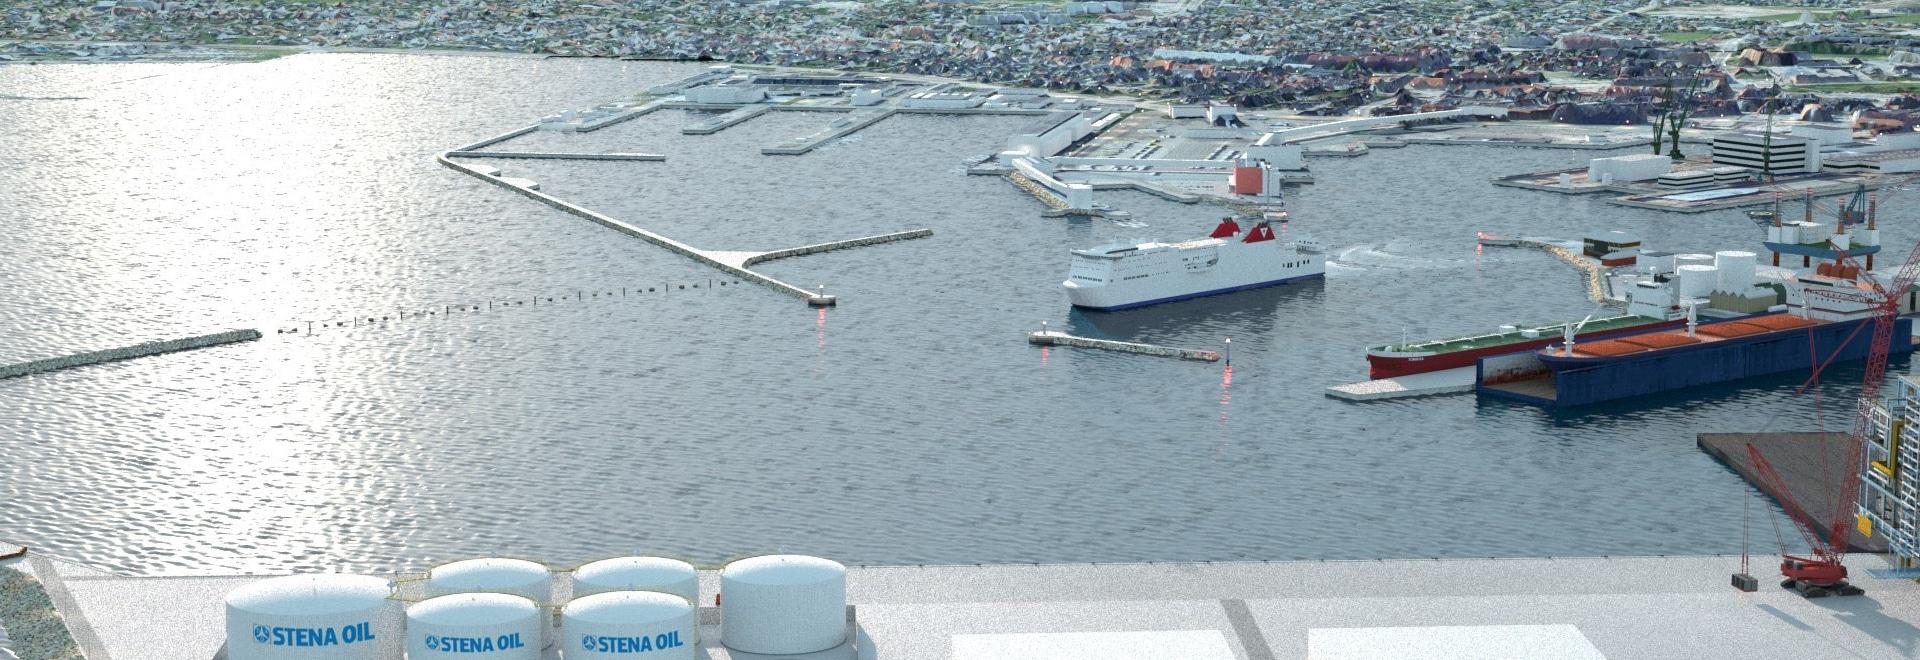 Stena Oil to Build 2020 Sulphur Cap Adapted Marine Fuel Terminal